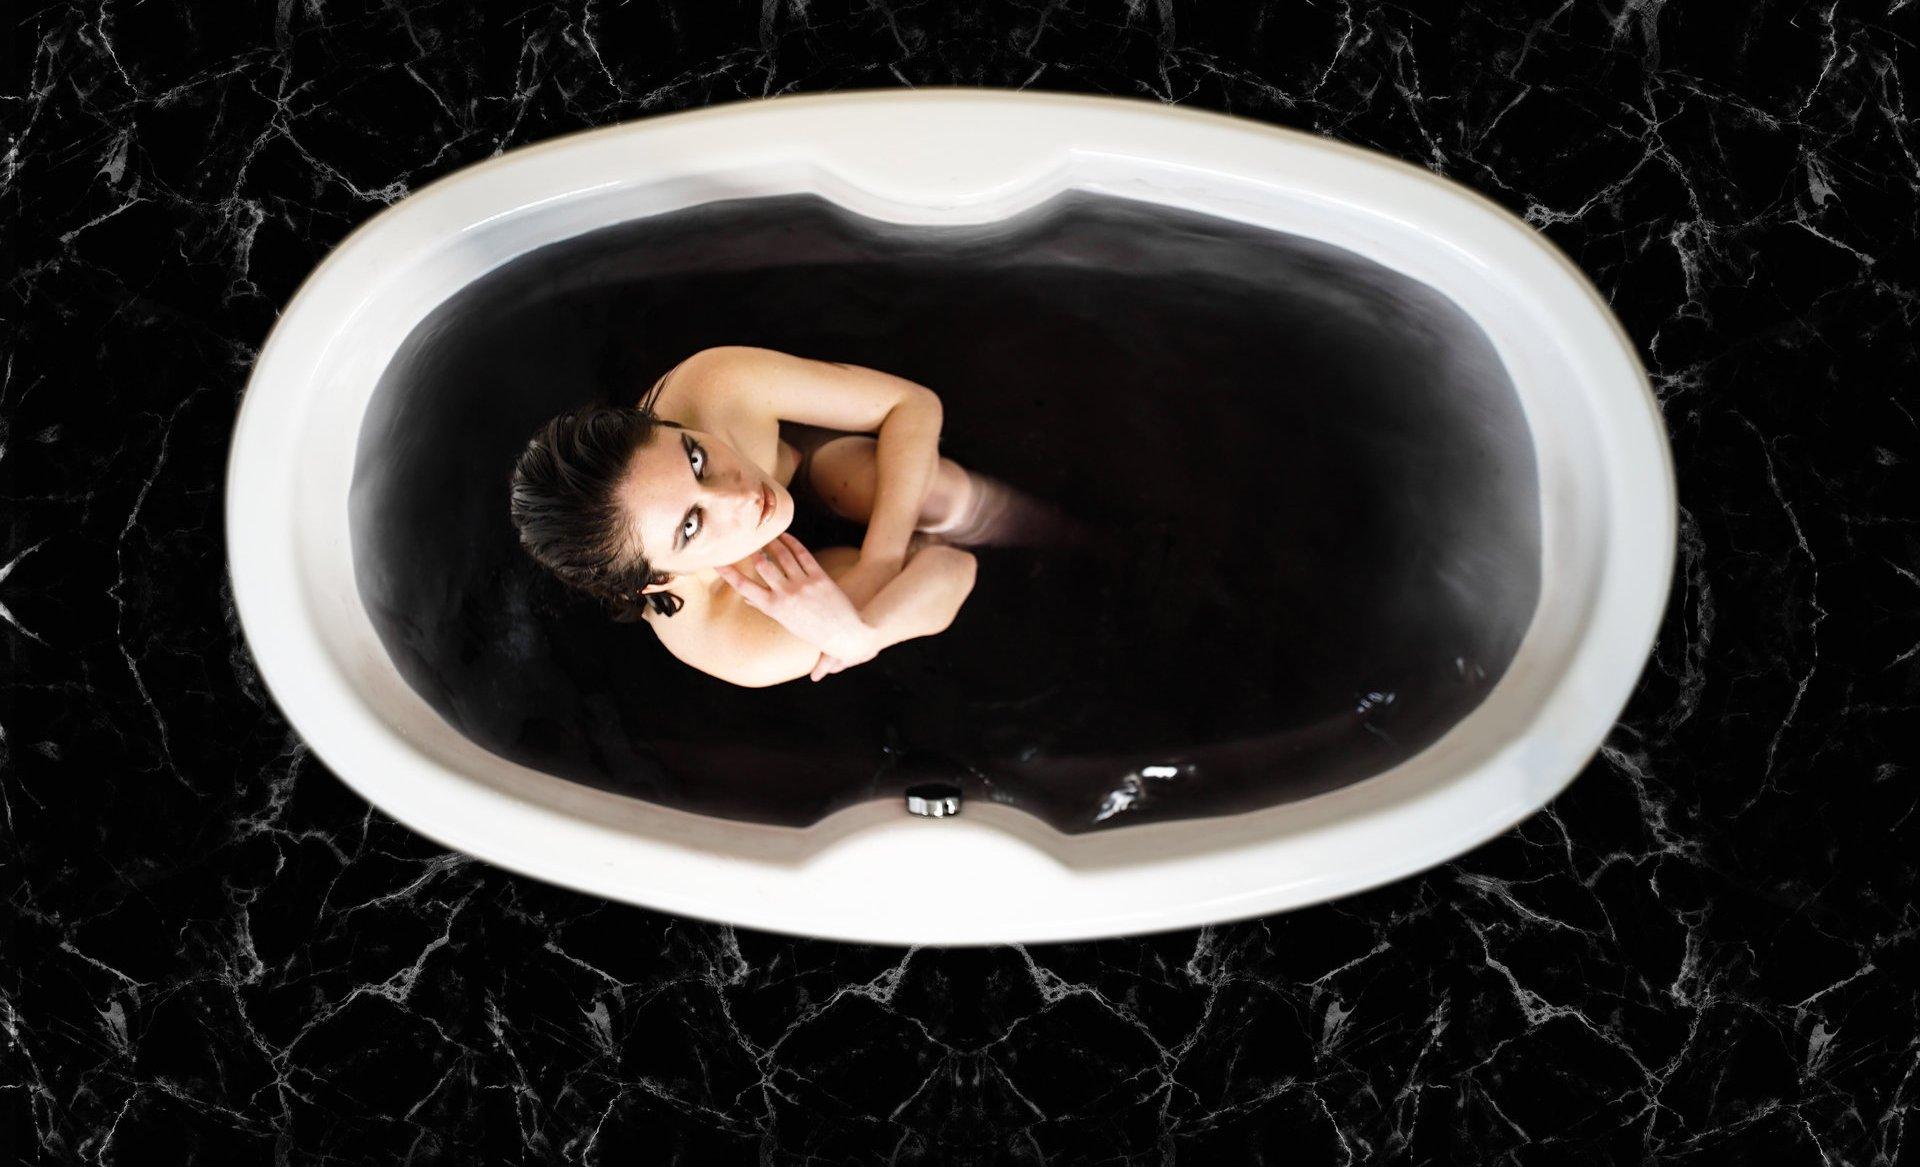 Bella Donna Bellatrixortreat Nudes Leaks 0068